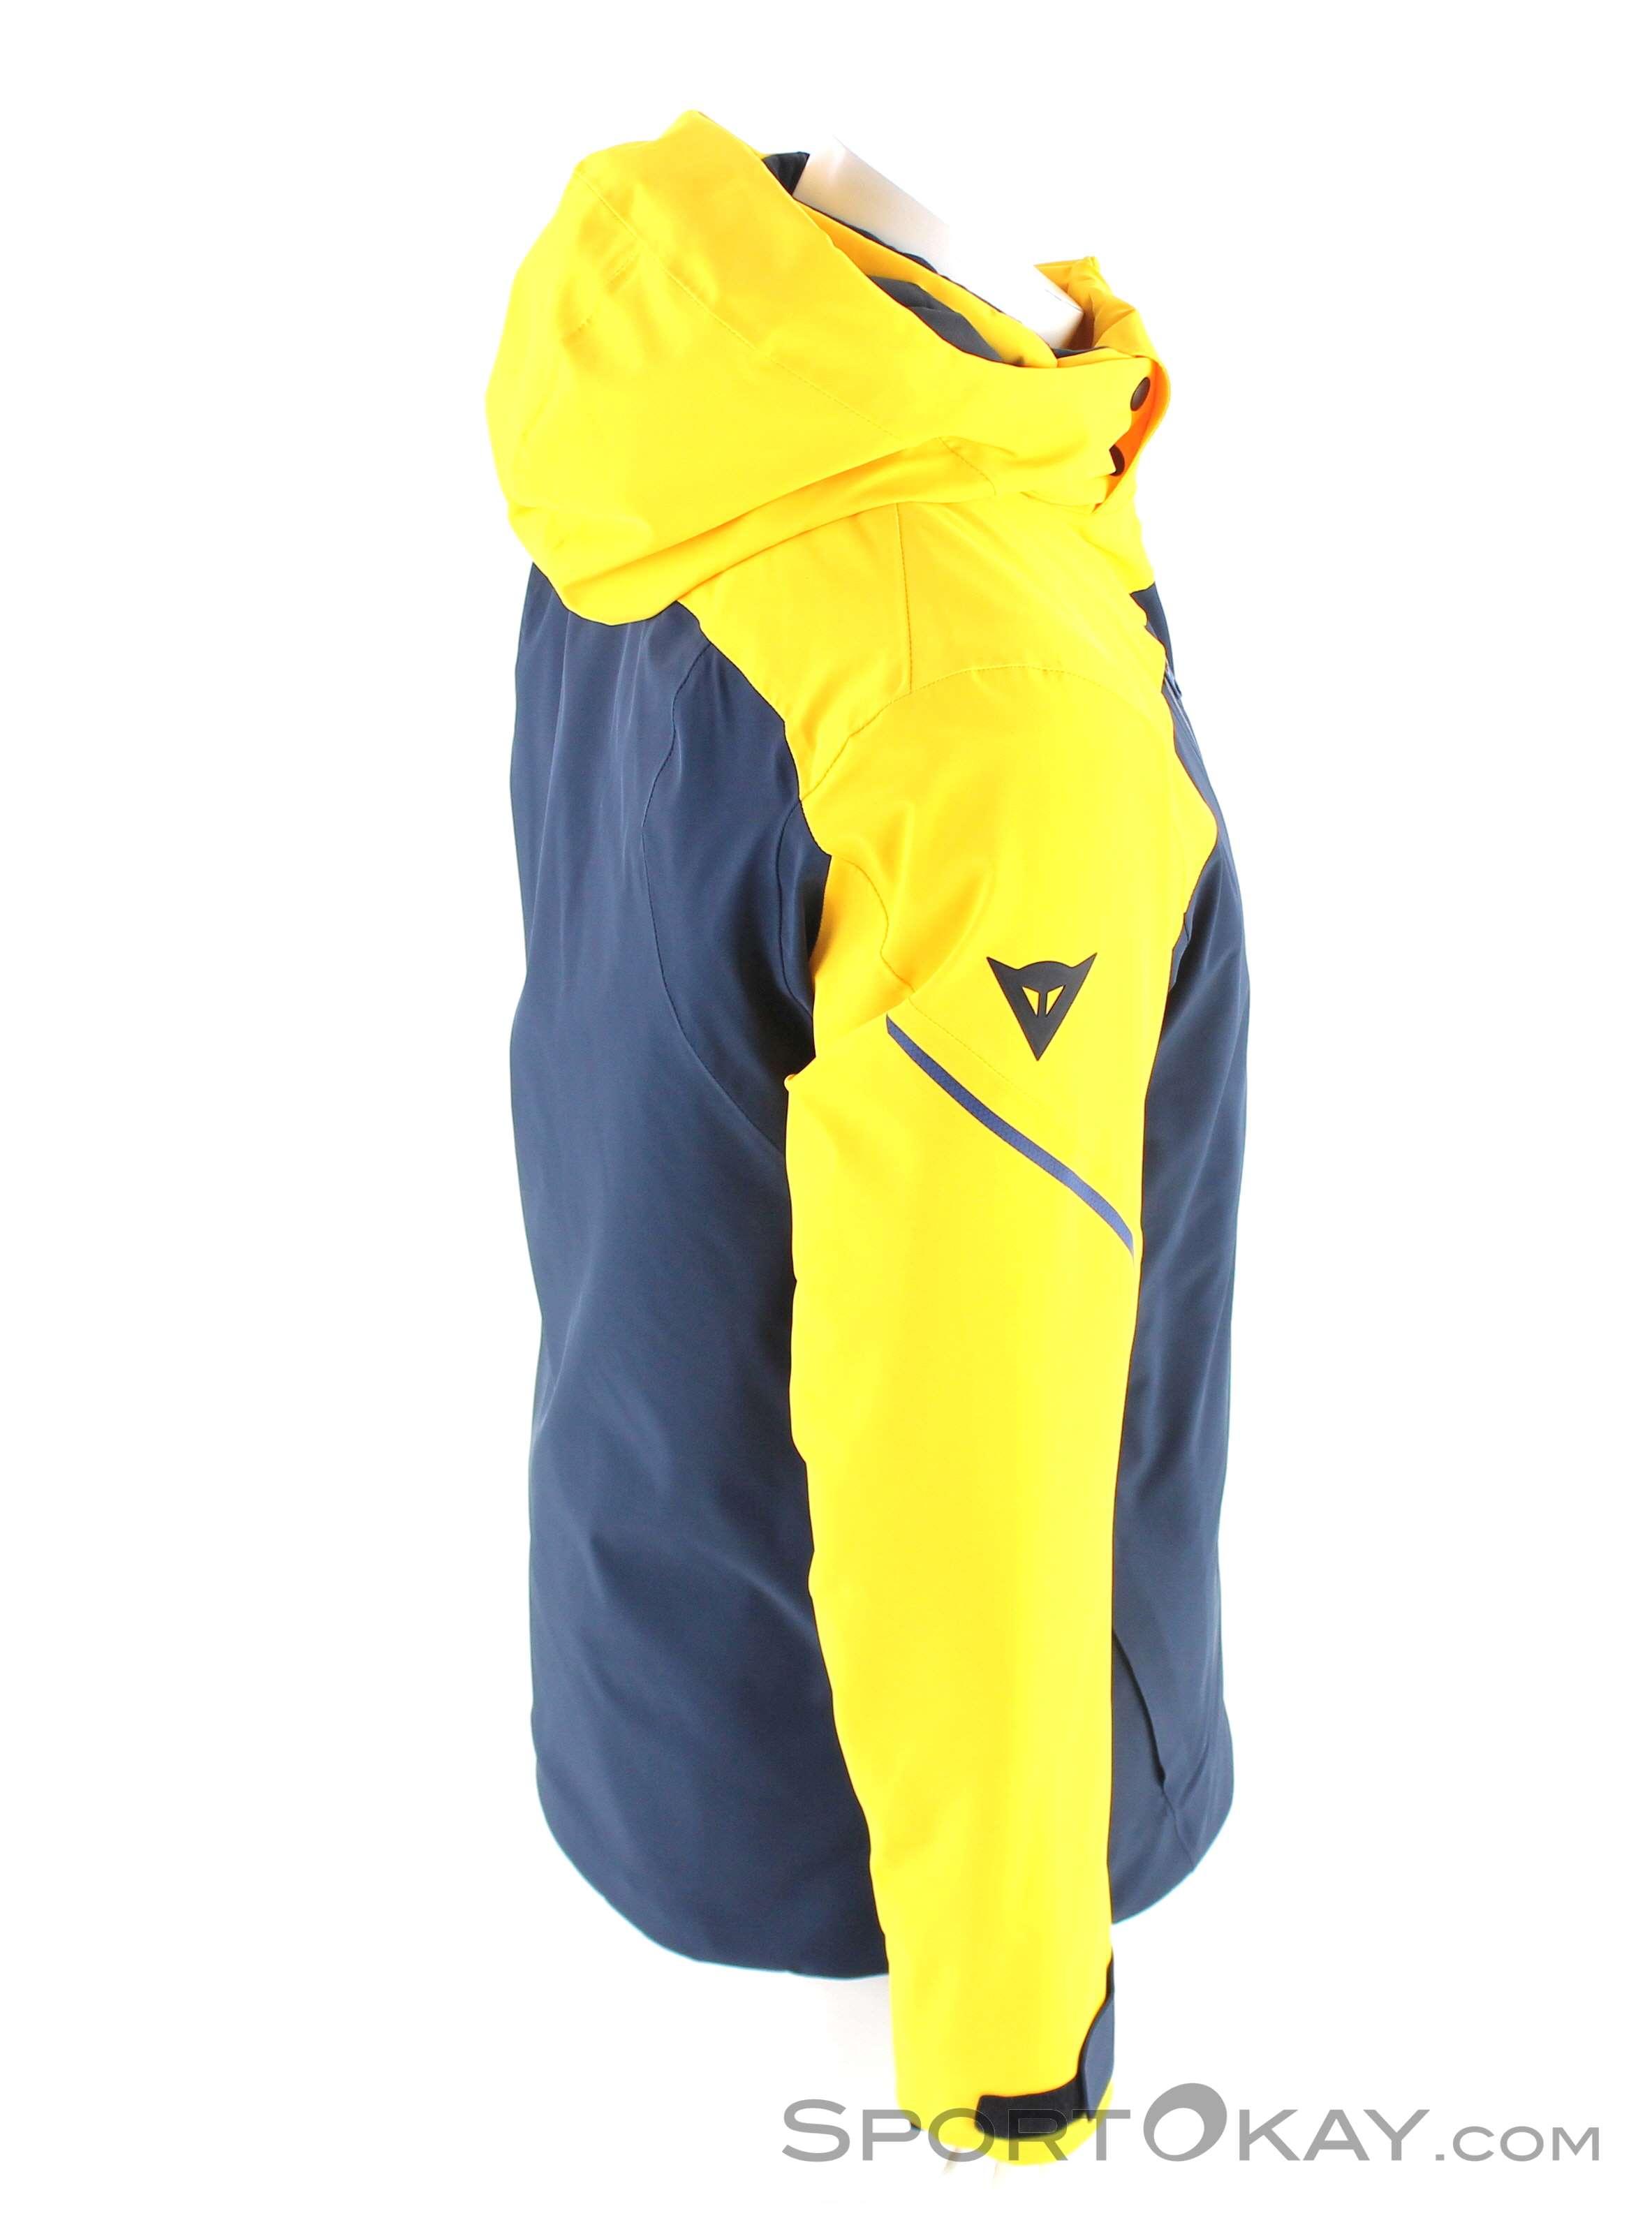 Dainese Dainese HP1 M3 Mens Ski Jacket